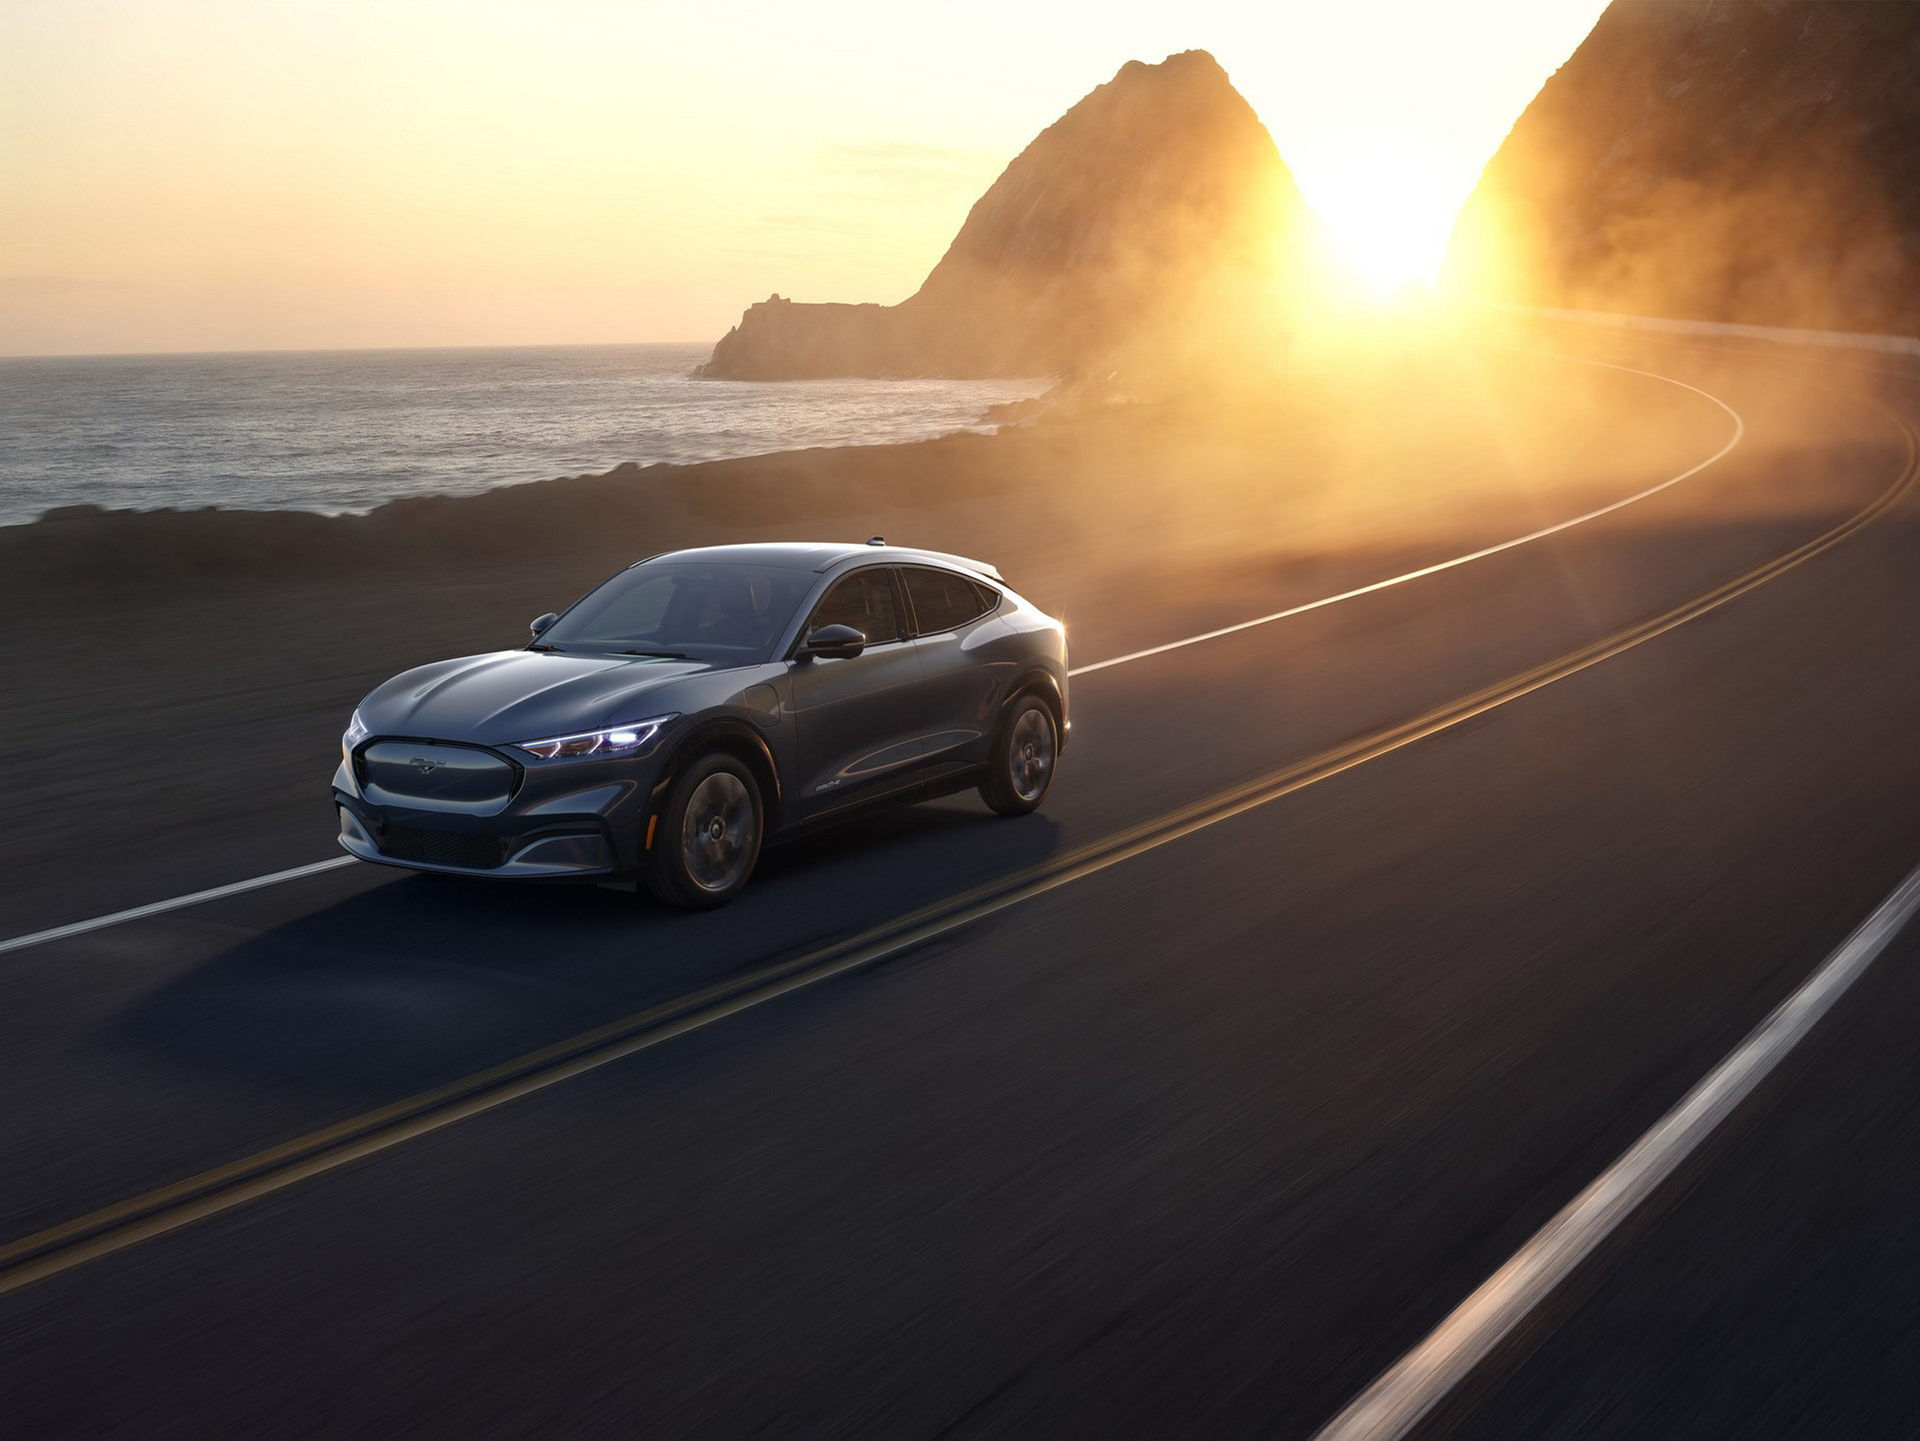 Ford presenterar eldrivna Mustang Mach-E